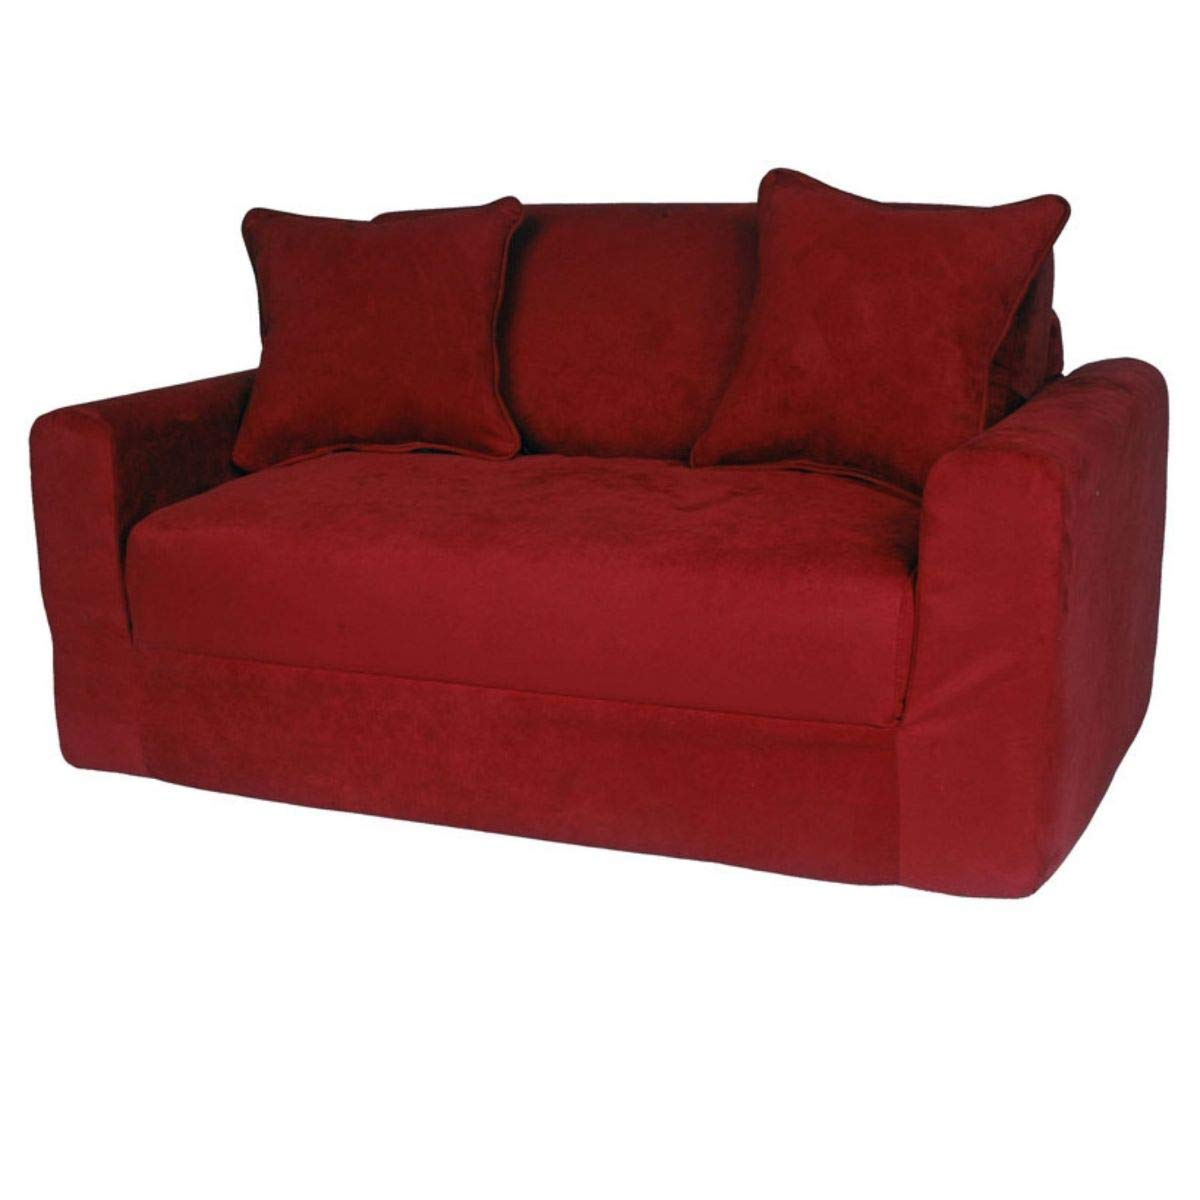 Amazon.com: Fun Furnishings - Sofá cama de ante: Kitchen ...